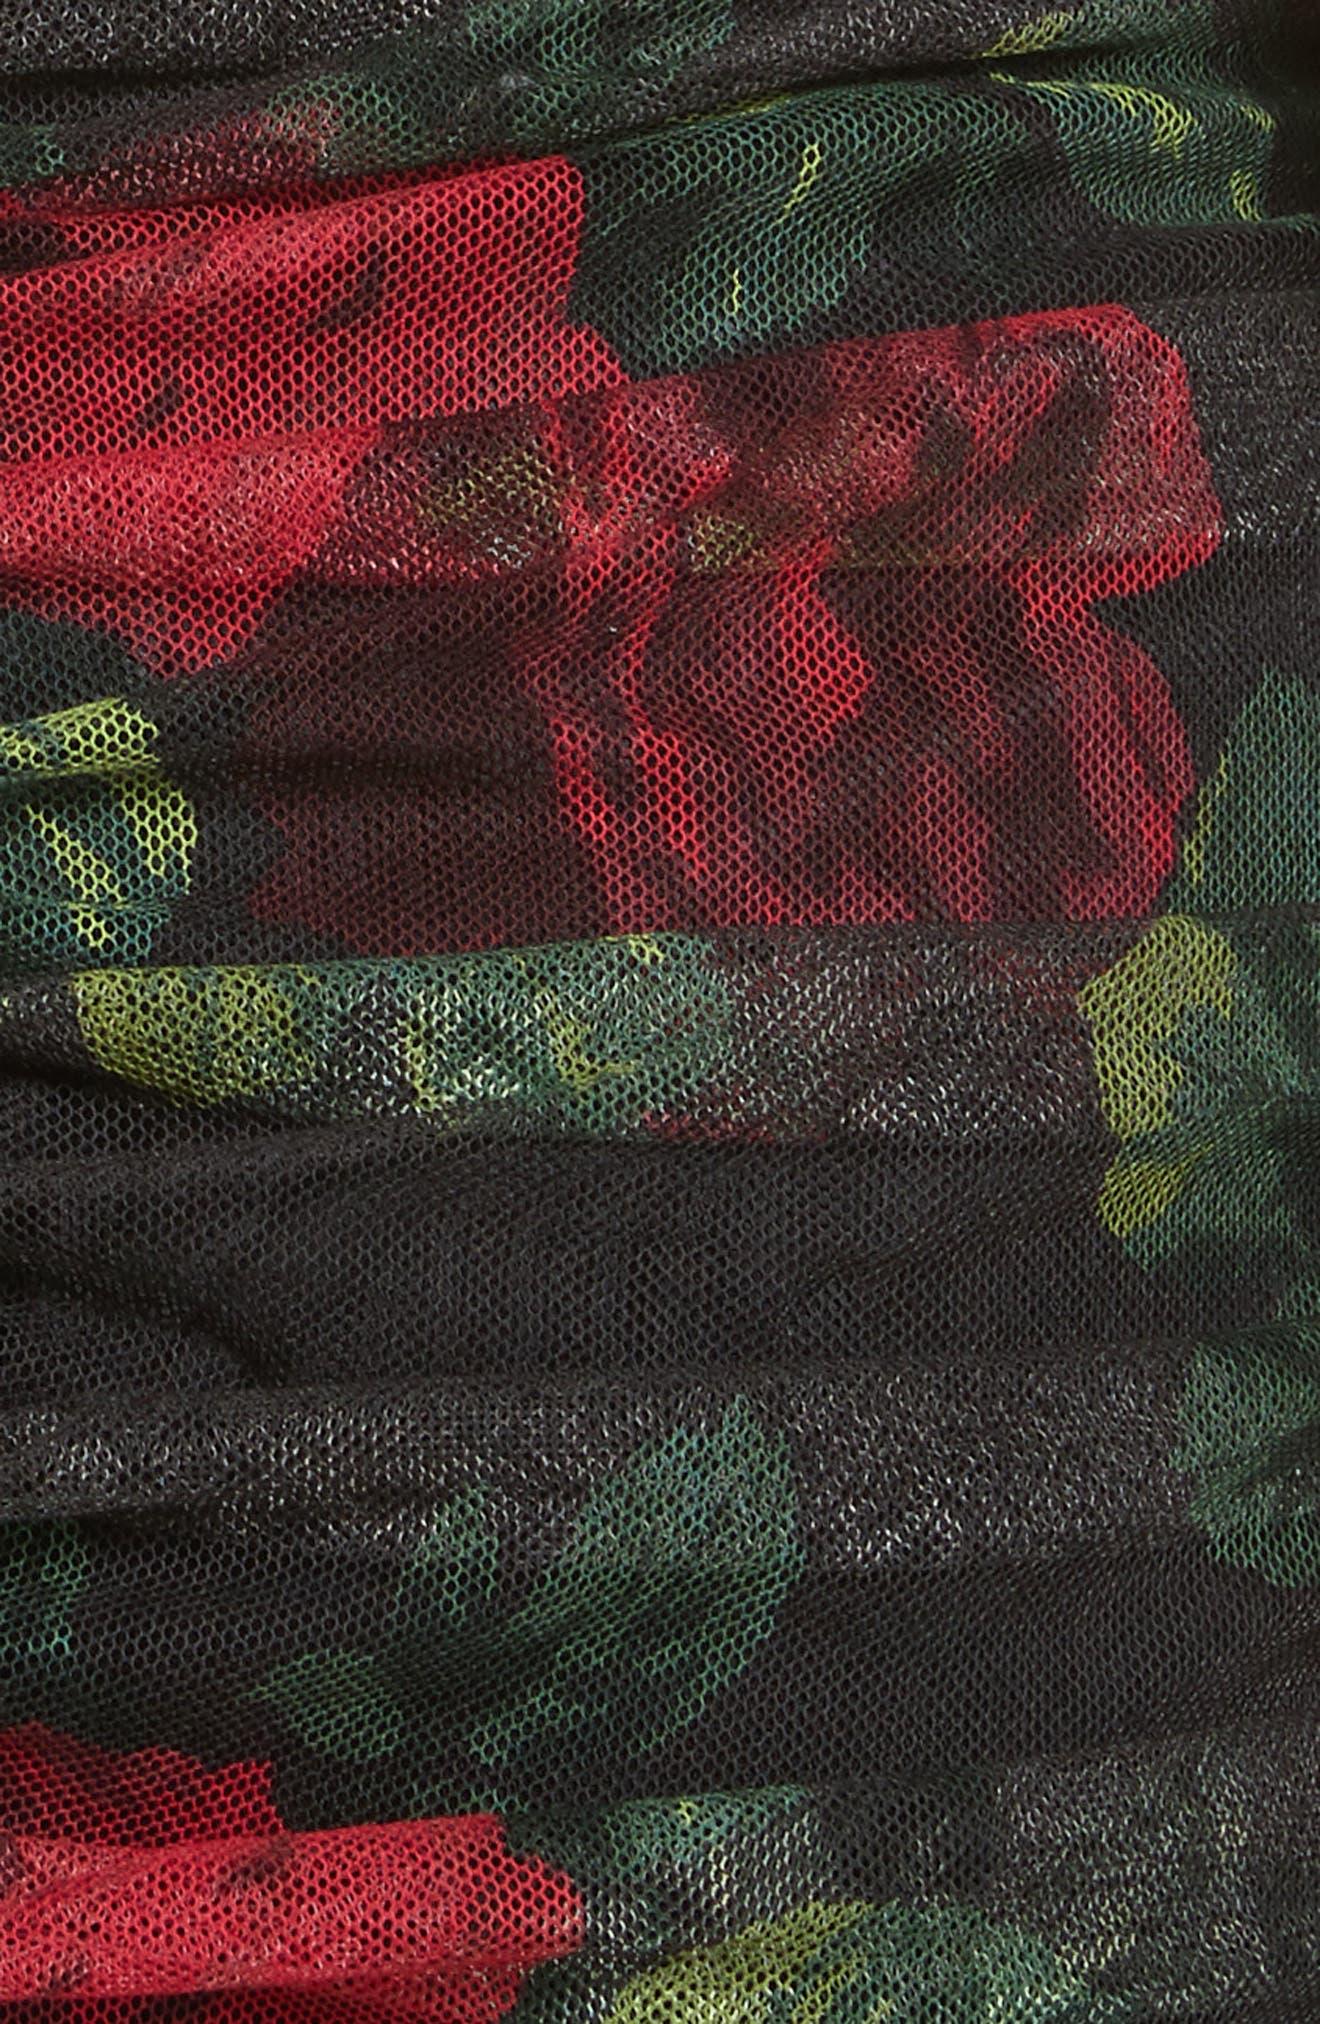 Rose Print Ruched Tulle Dress,                             Alternate thumbnail 6, color,                             Rose Print